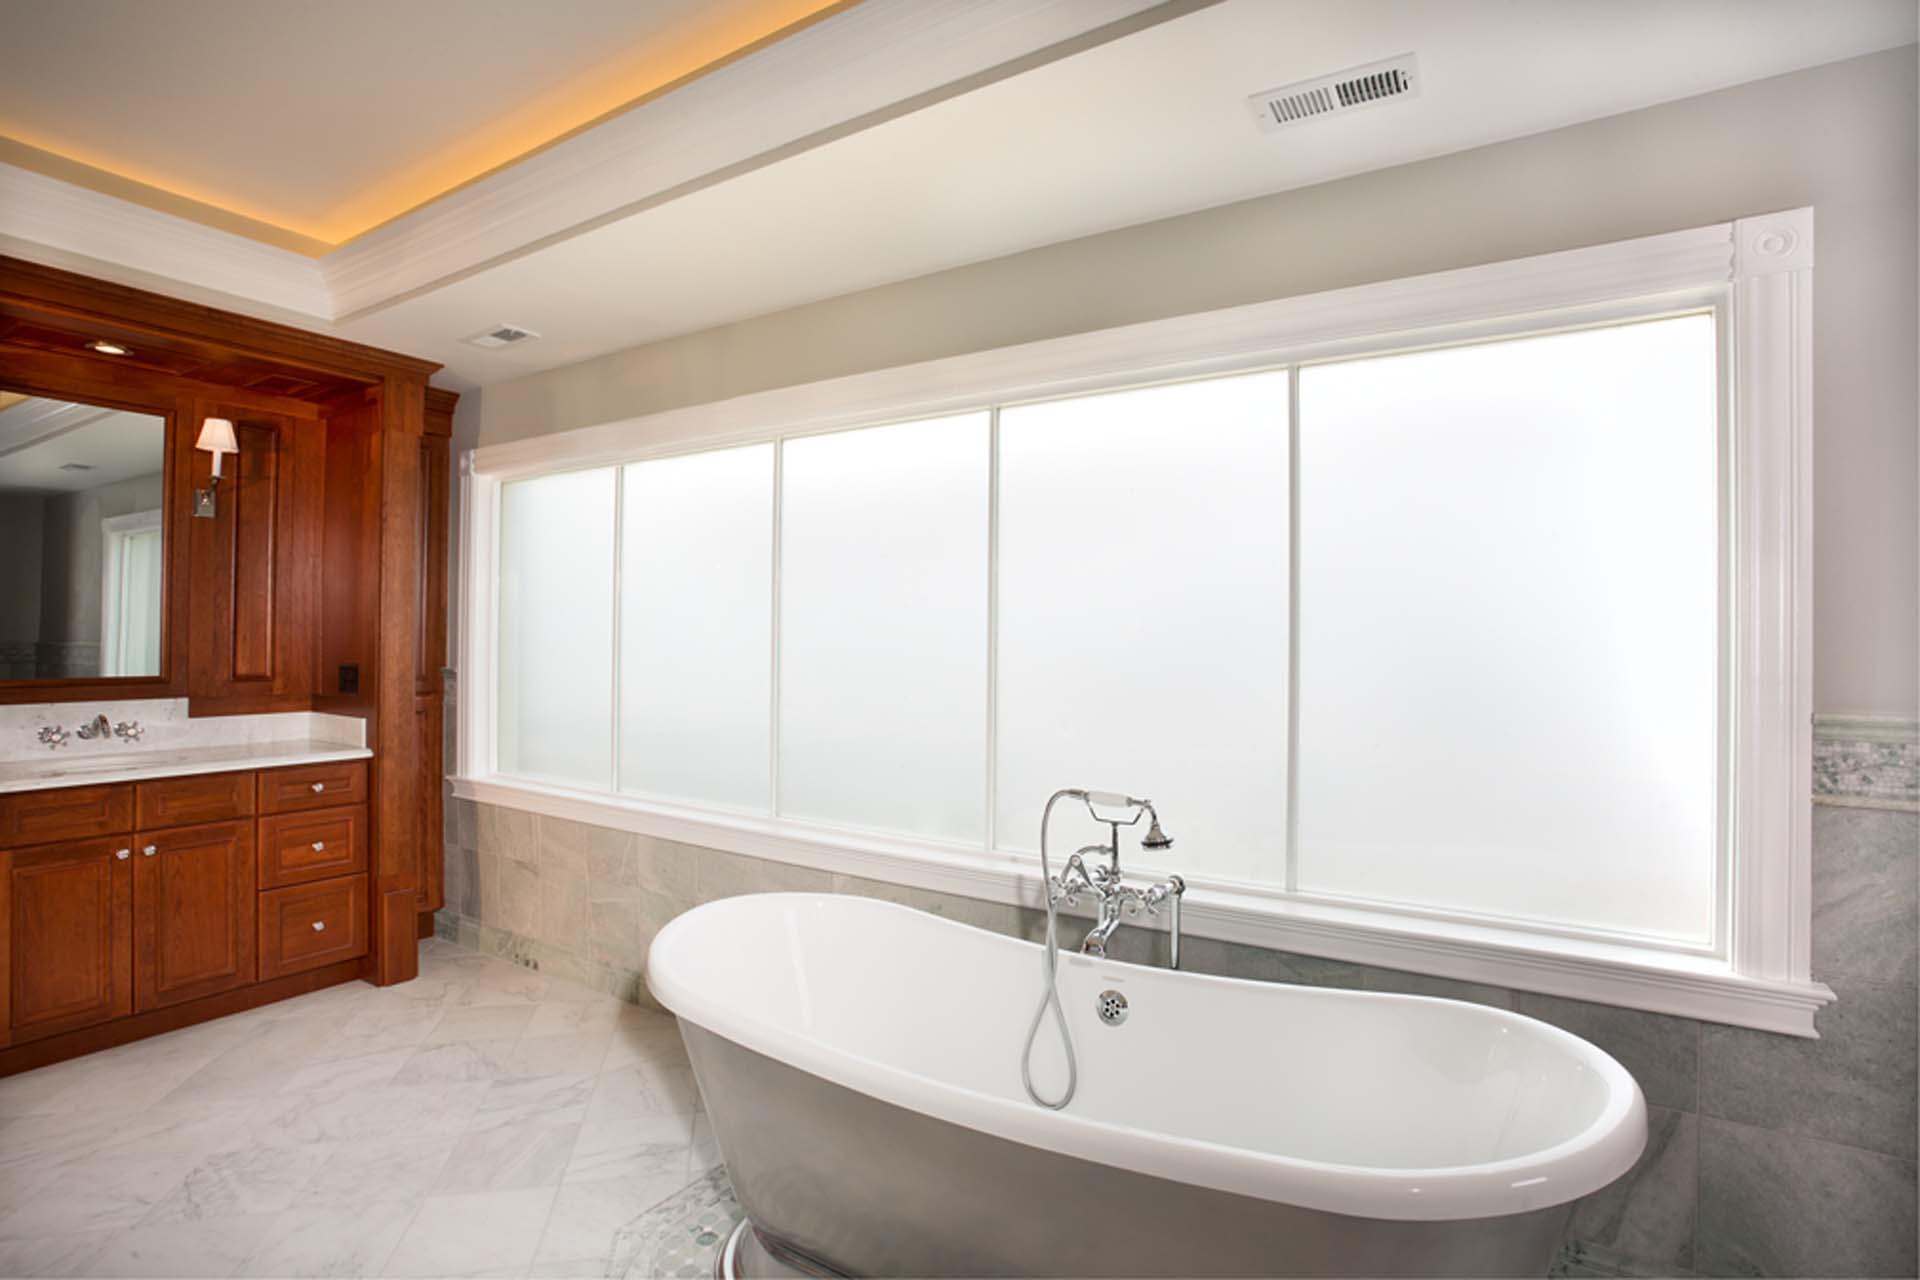 hazed windows in bathroom